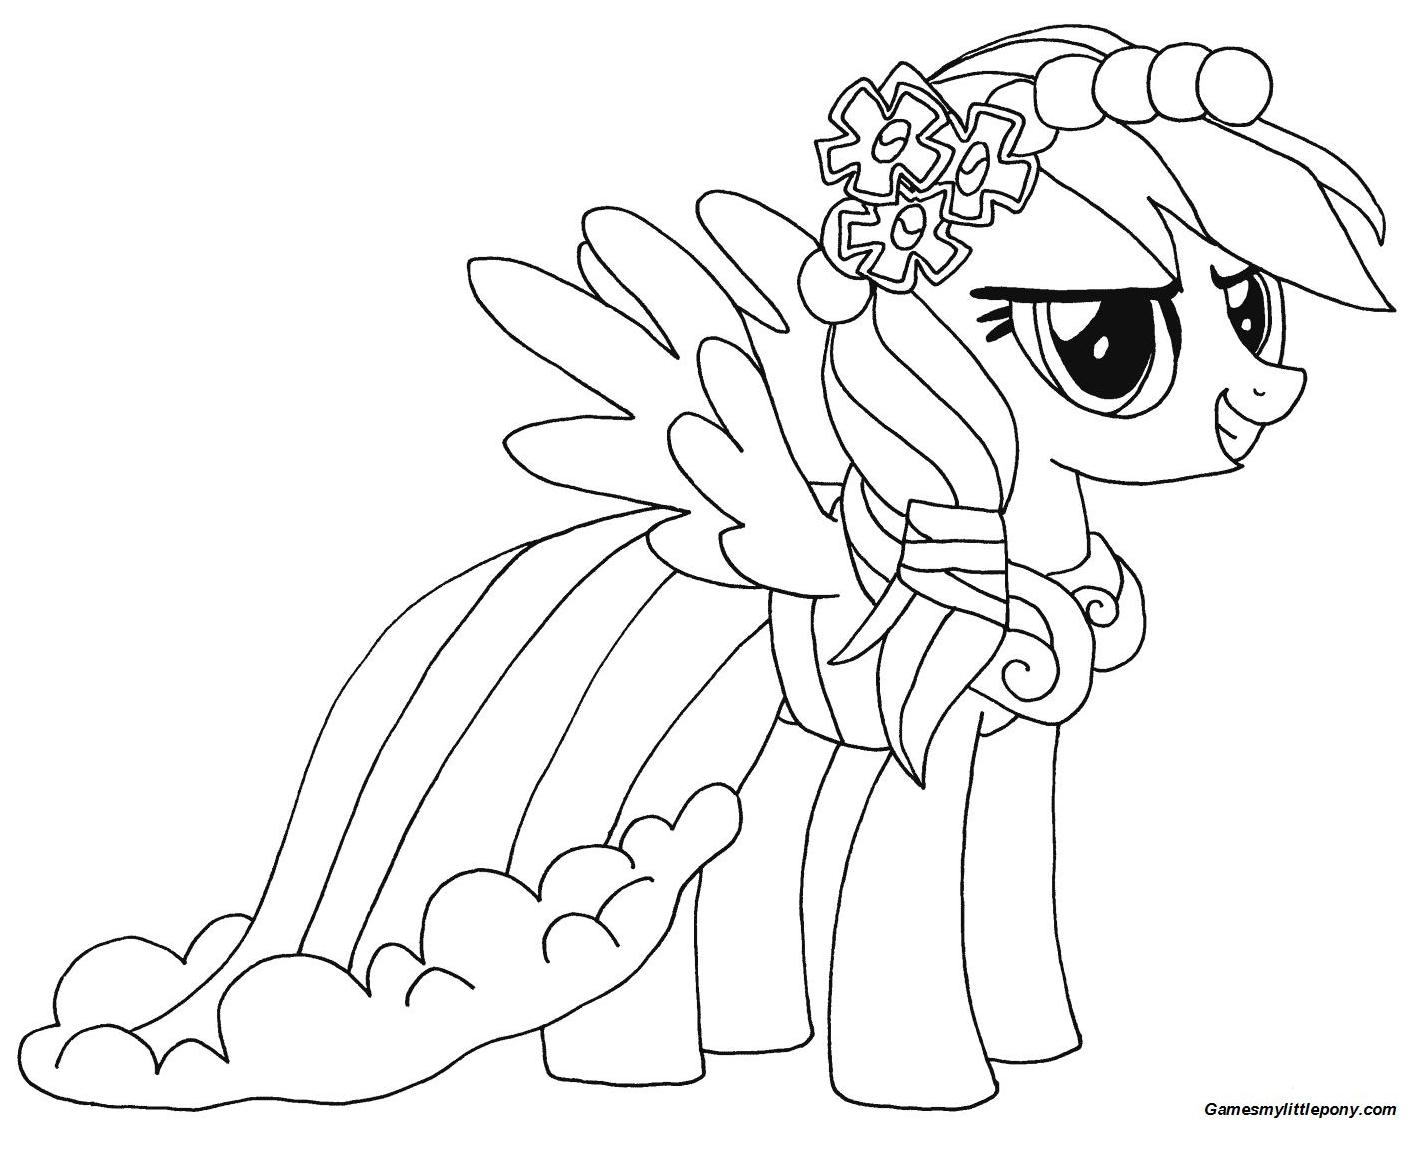 Rainbow Dash from My Little Pony